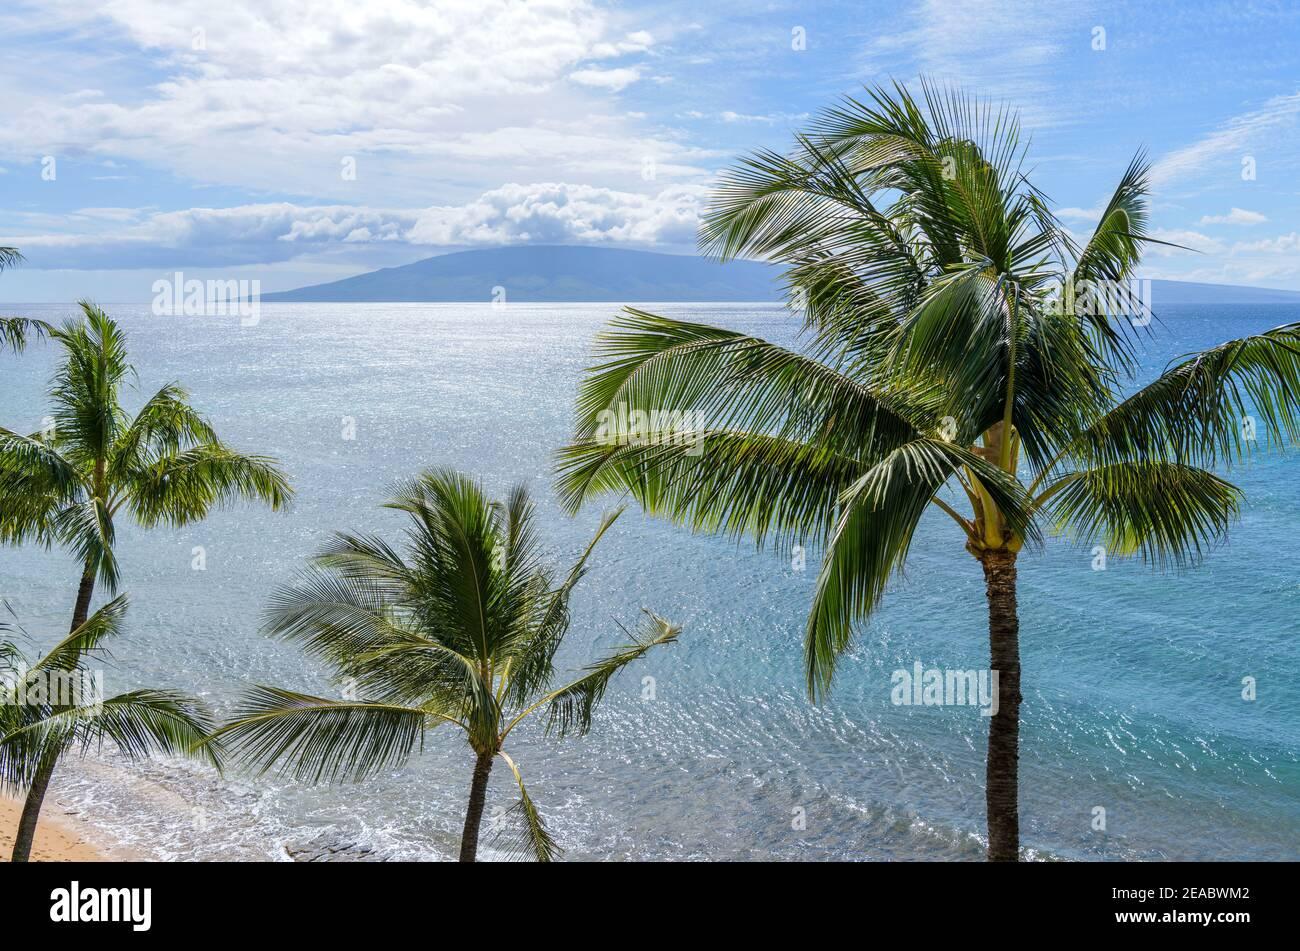 Tropical Island - A bright sunny day at north-west coast of Maui island, with Lanai island at horizon. Maui, Hawaii, USA. Stock Photo